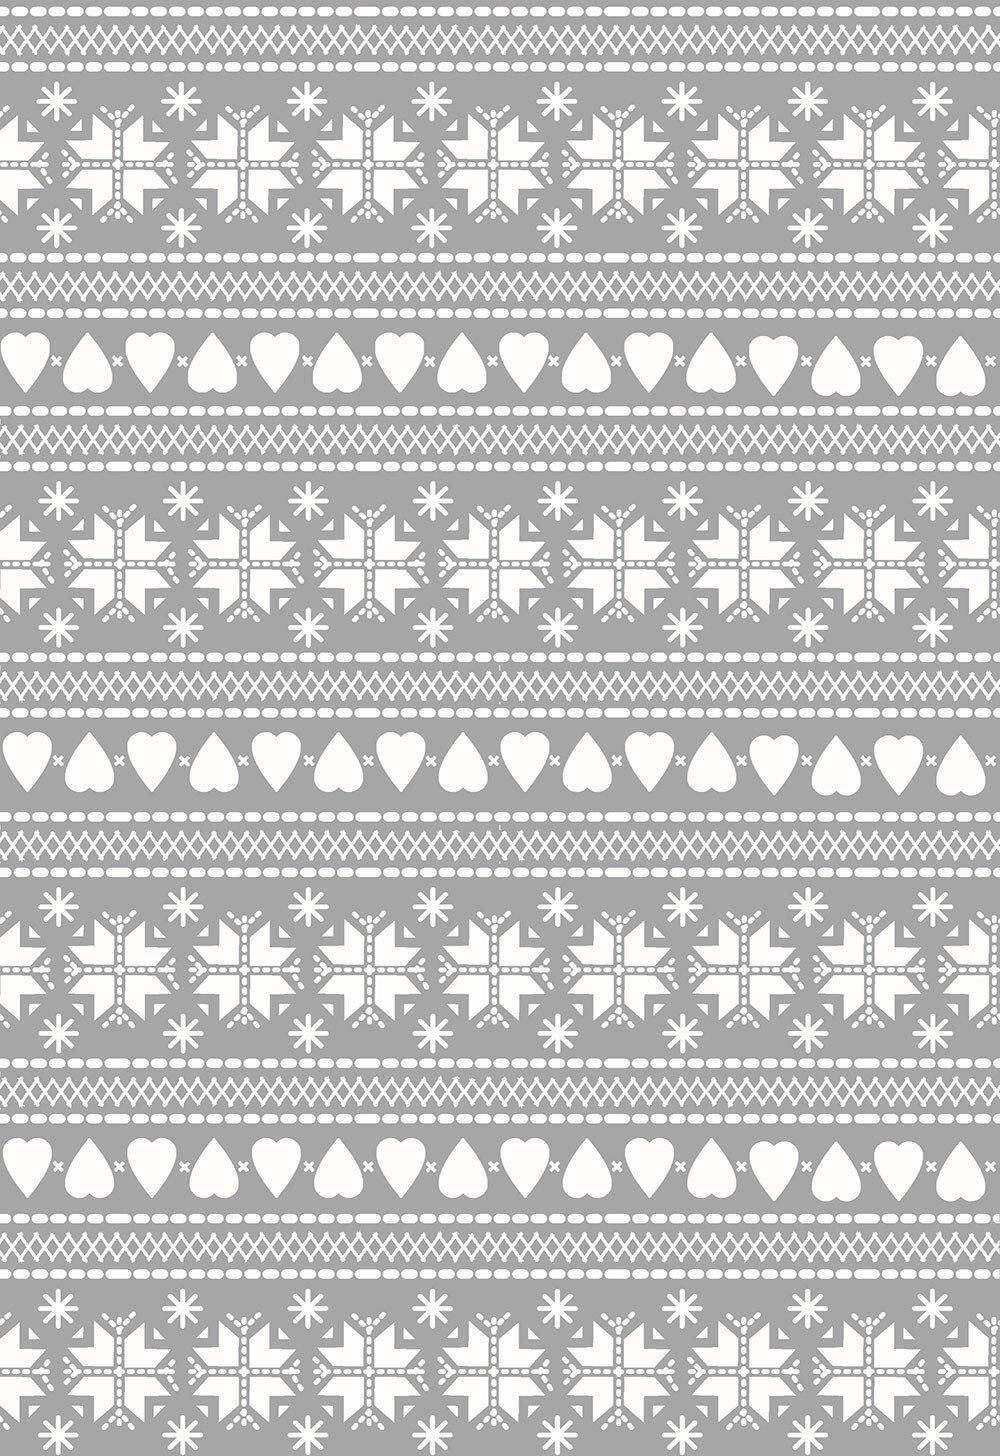 Nordic Hygge - Sweater Print Grey